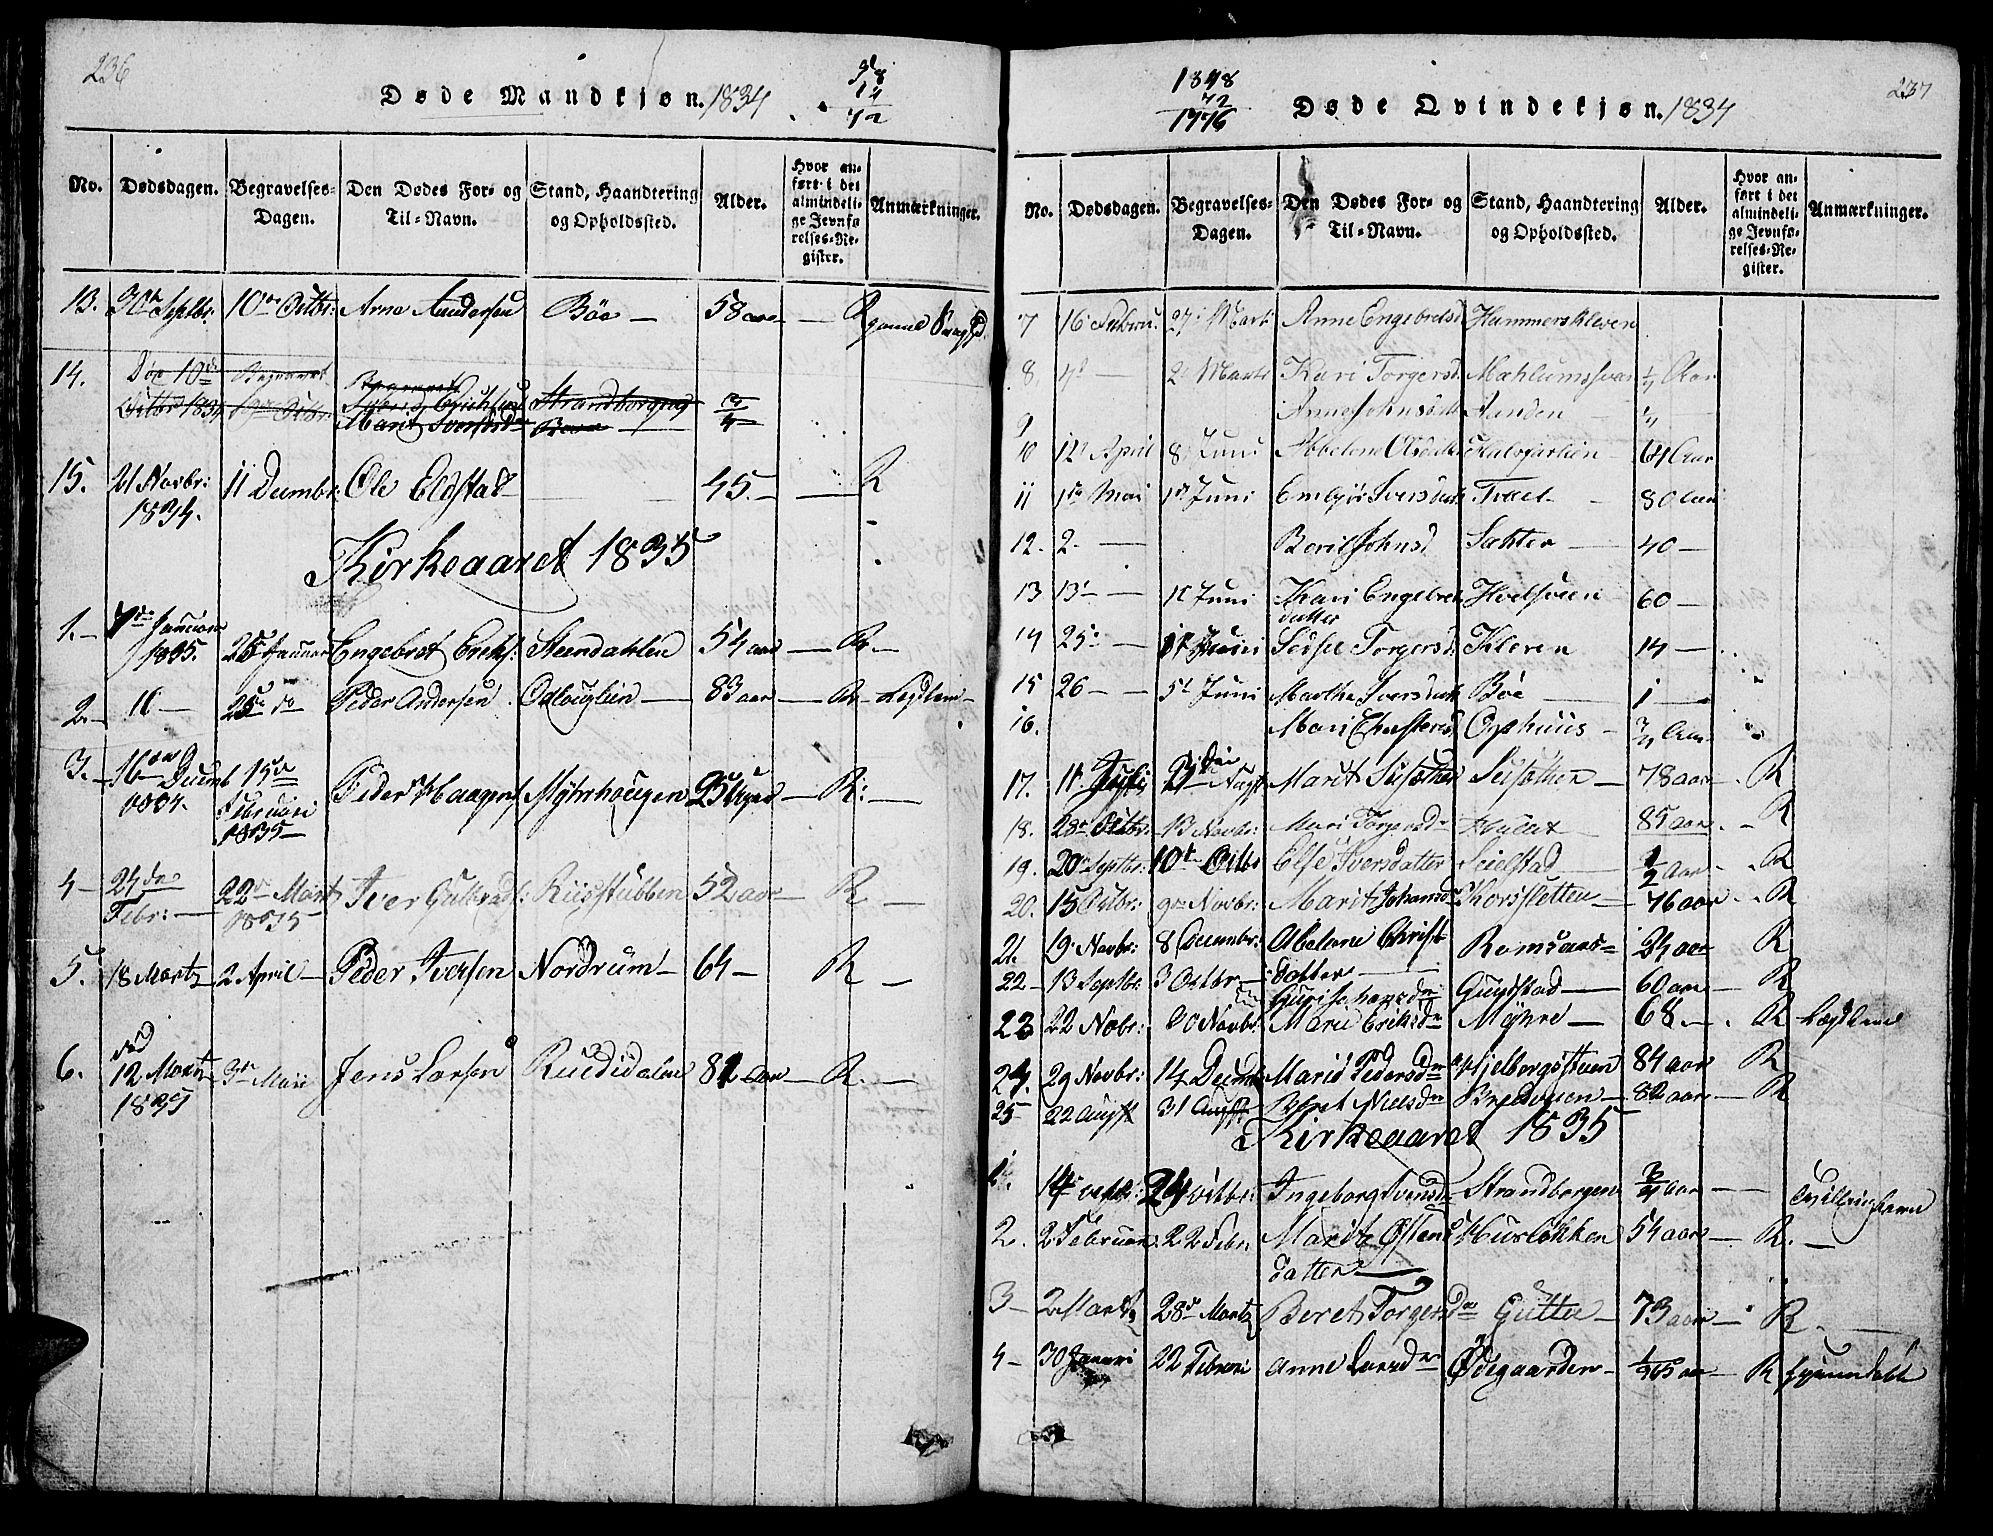 SAH, Ringebu prestekontor, Klokkerbok nr. 1, 1821-1839, s. 236-237